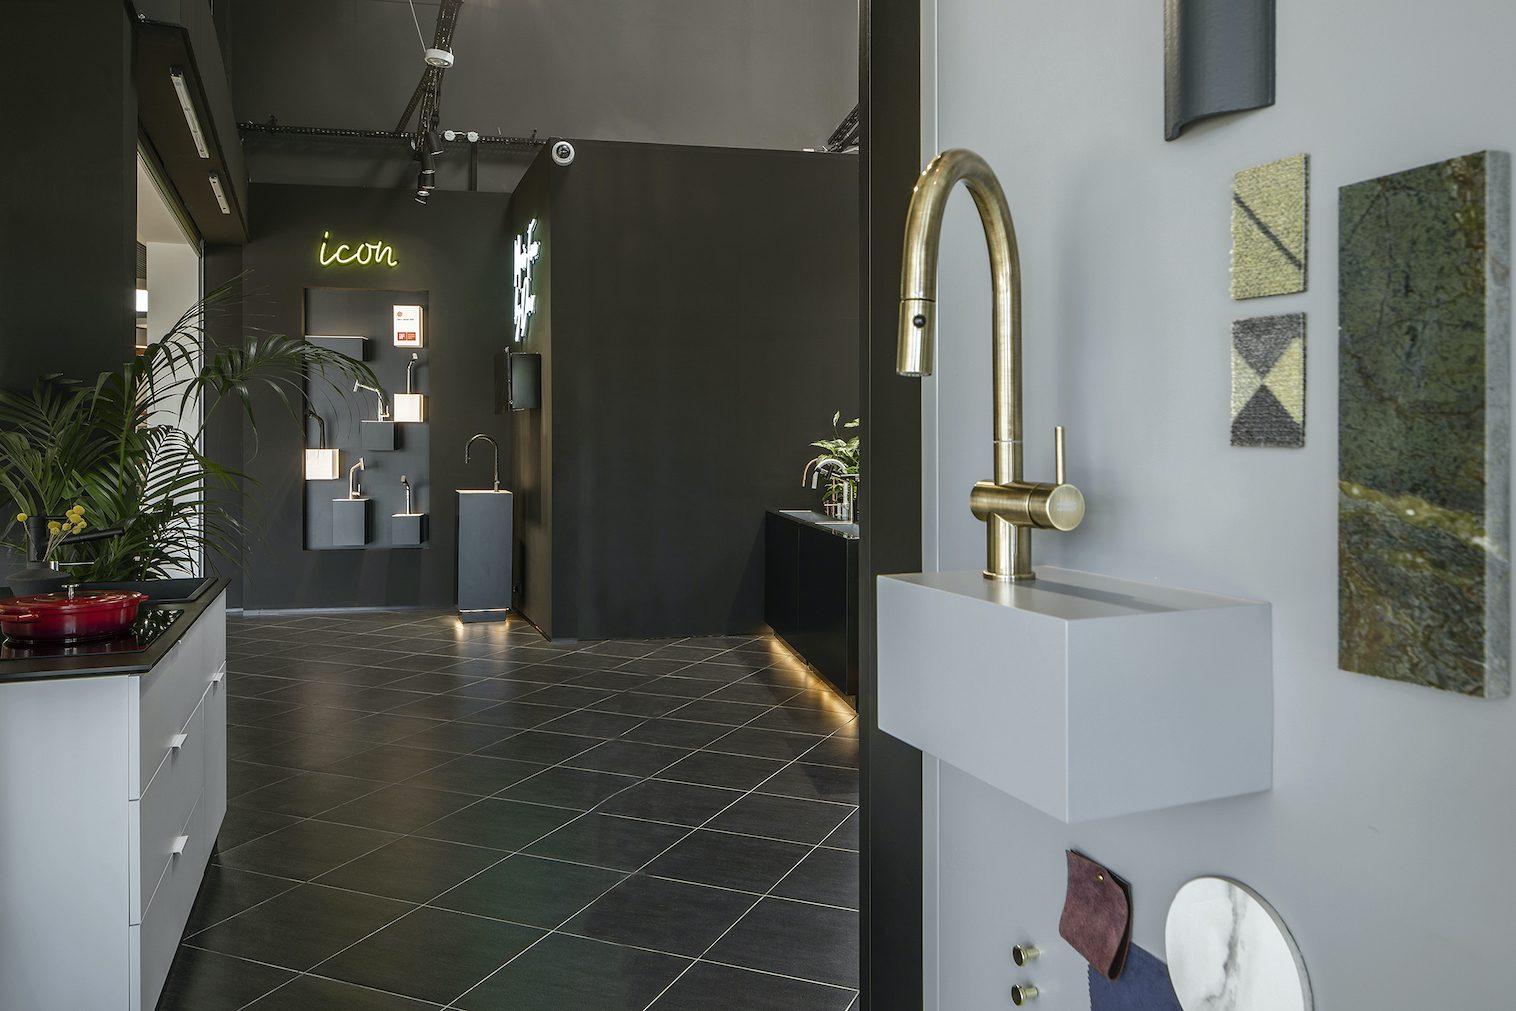 9-Showroom_Franke_Homepark_Janki_fot_Yassen_Hristov